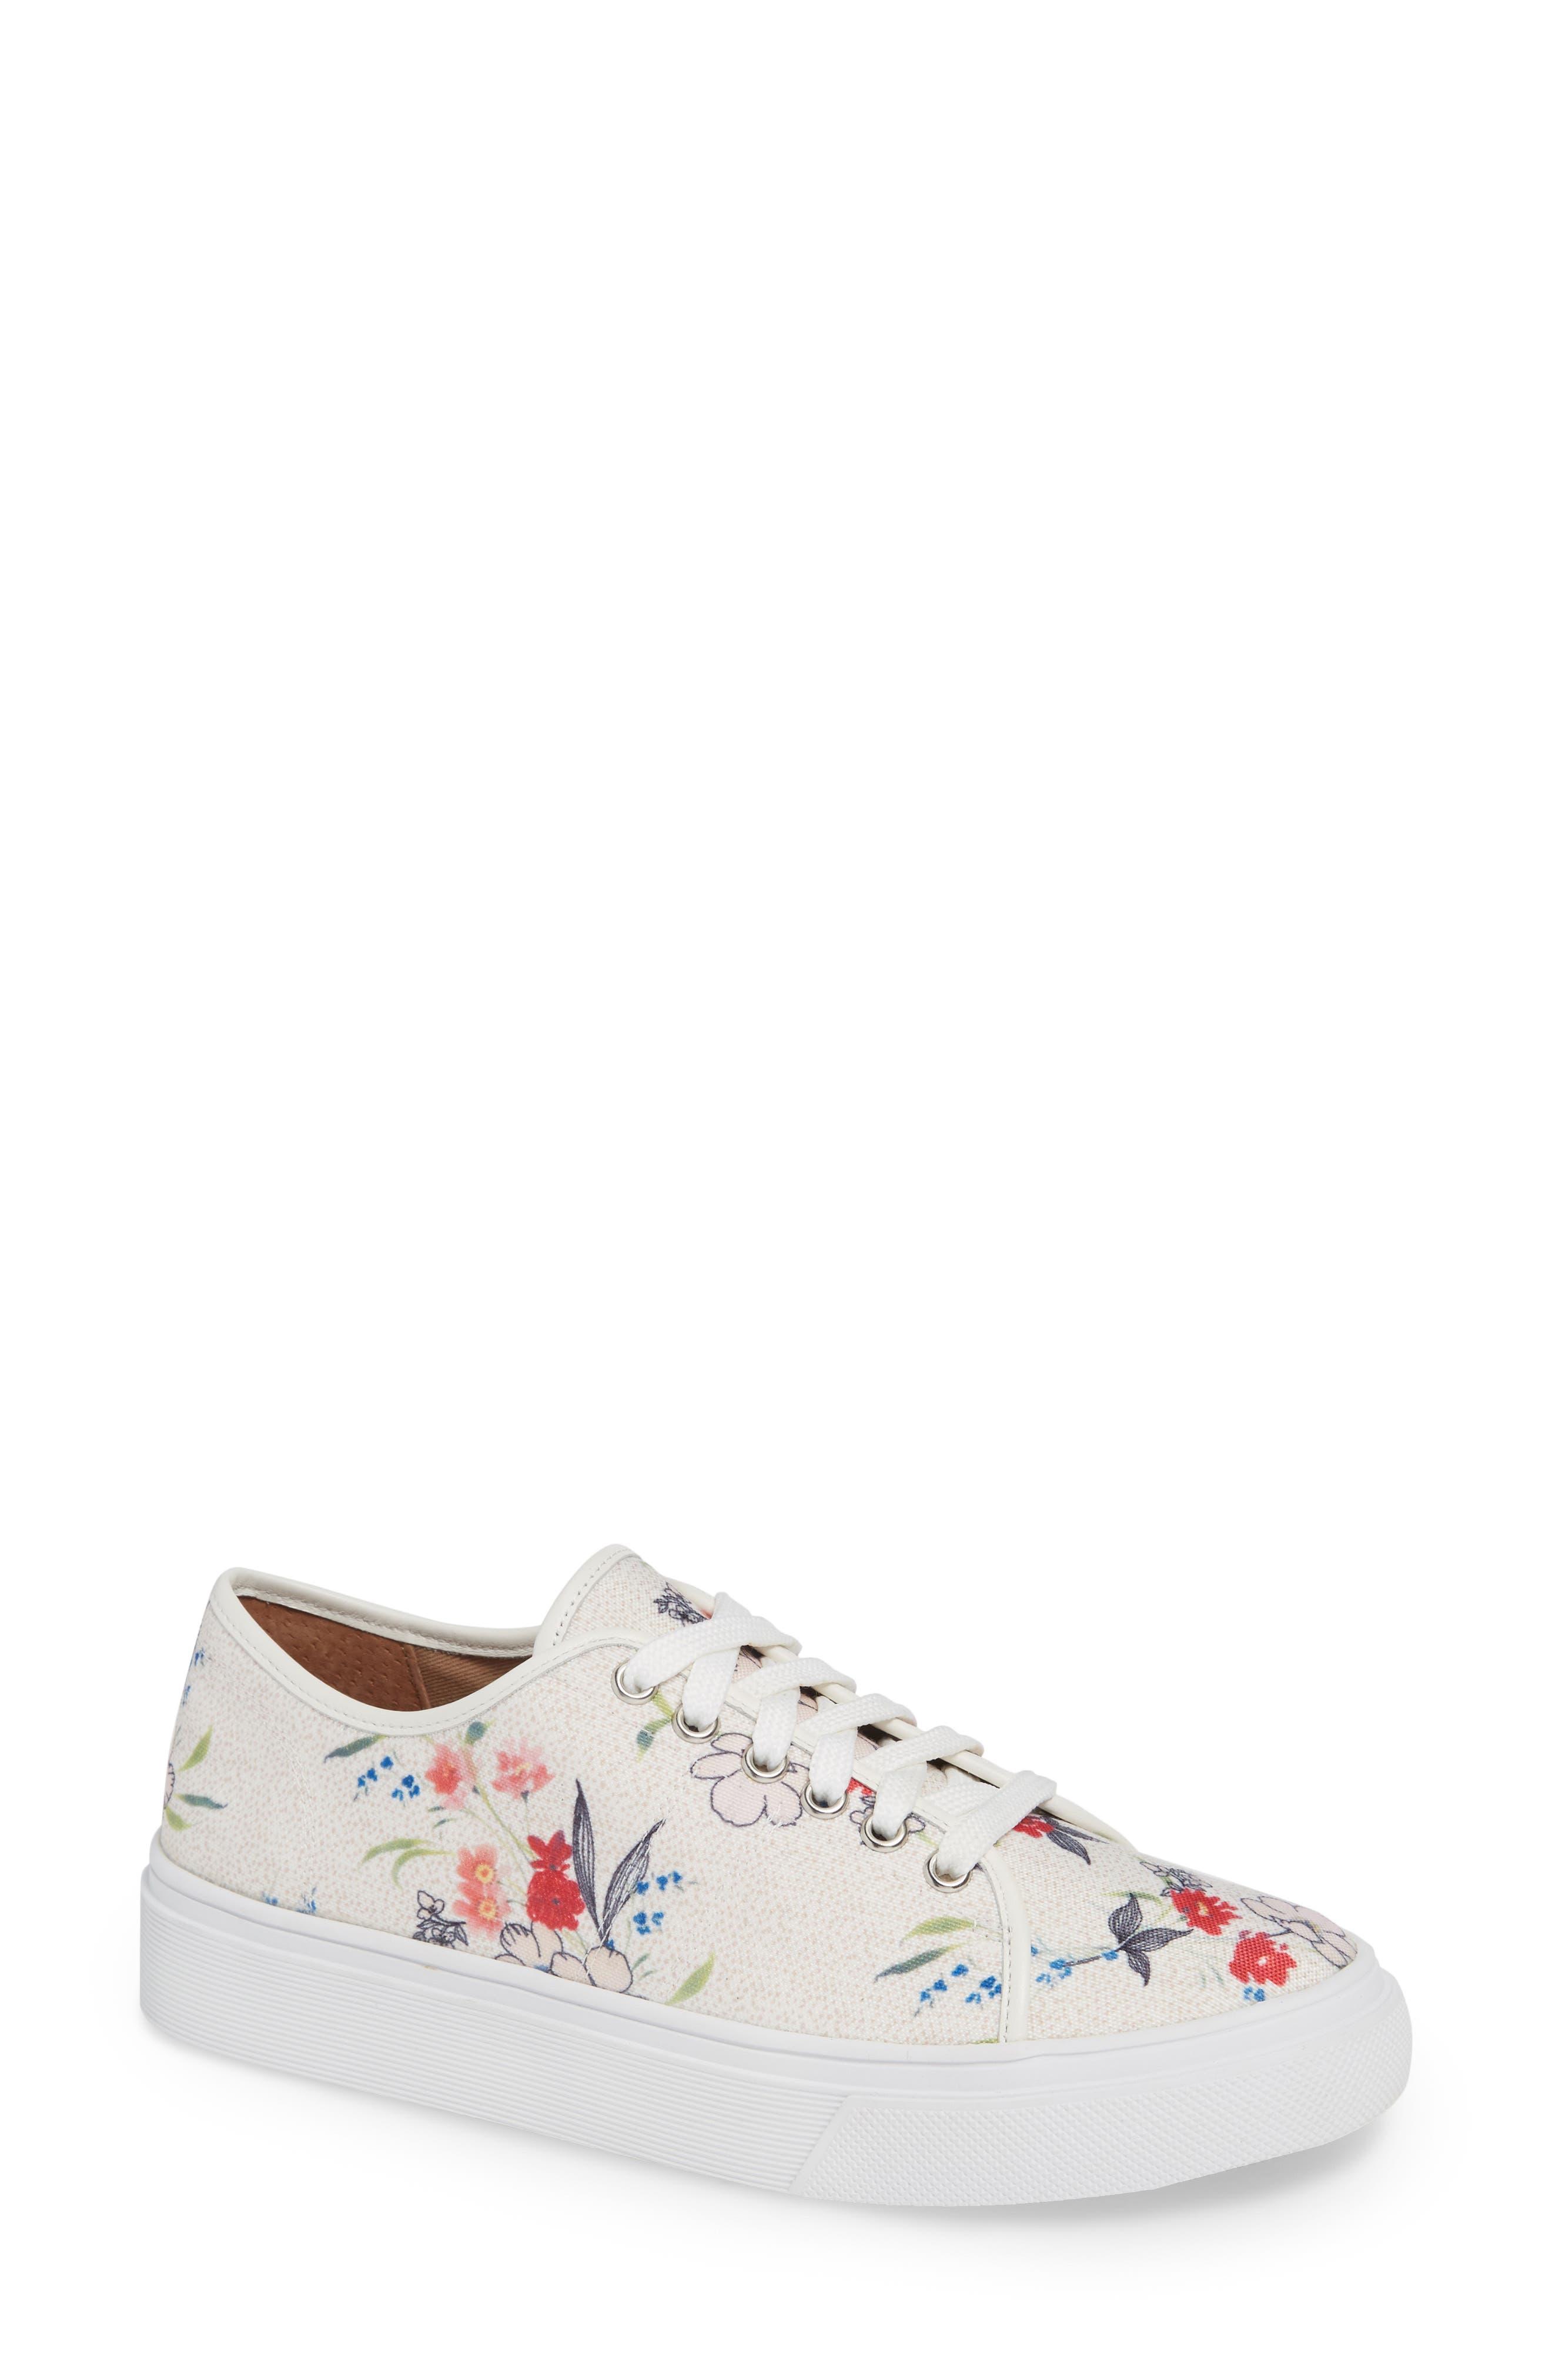 Ethan Low-Top Sneaker,                             Main thumbnail 1, color,                             WHITE FLORAL CANVAS